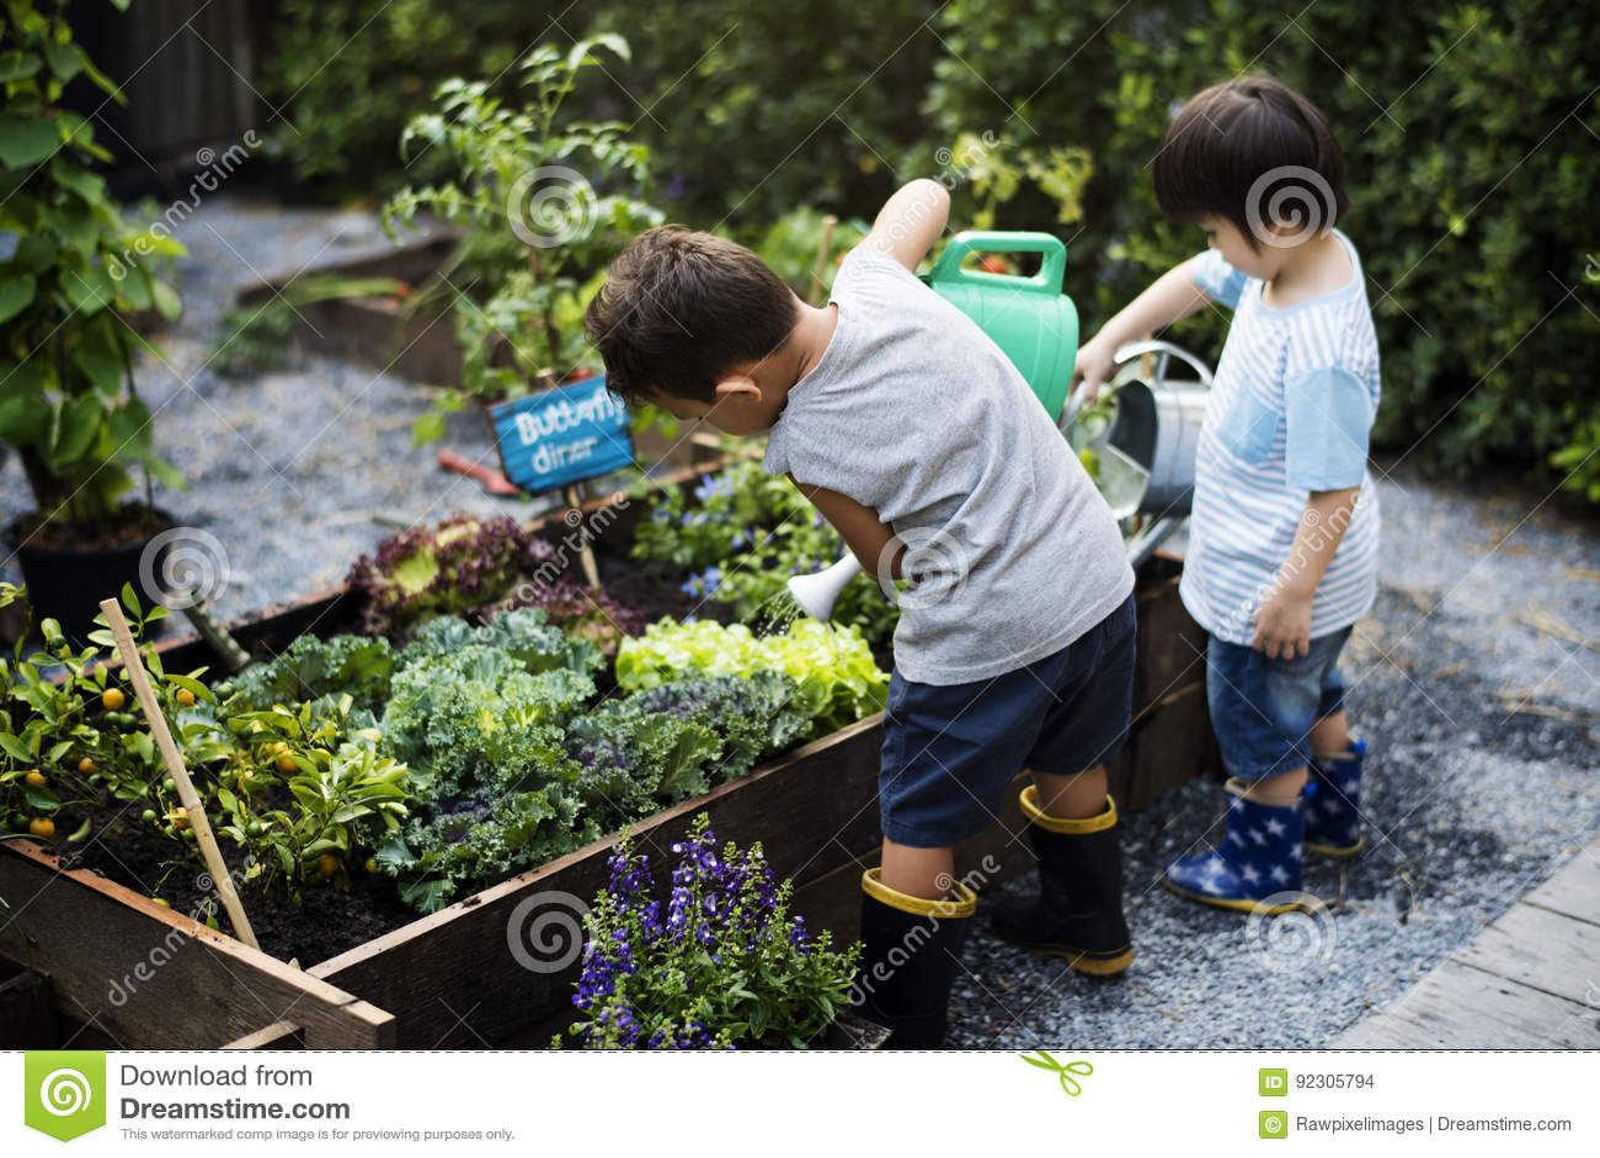 Group Of Kindergarten Kids Learning Gardening Outdoors Stock Photo